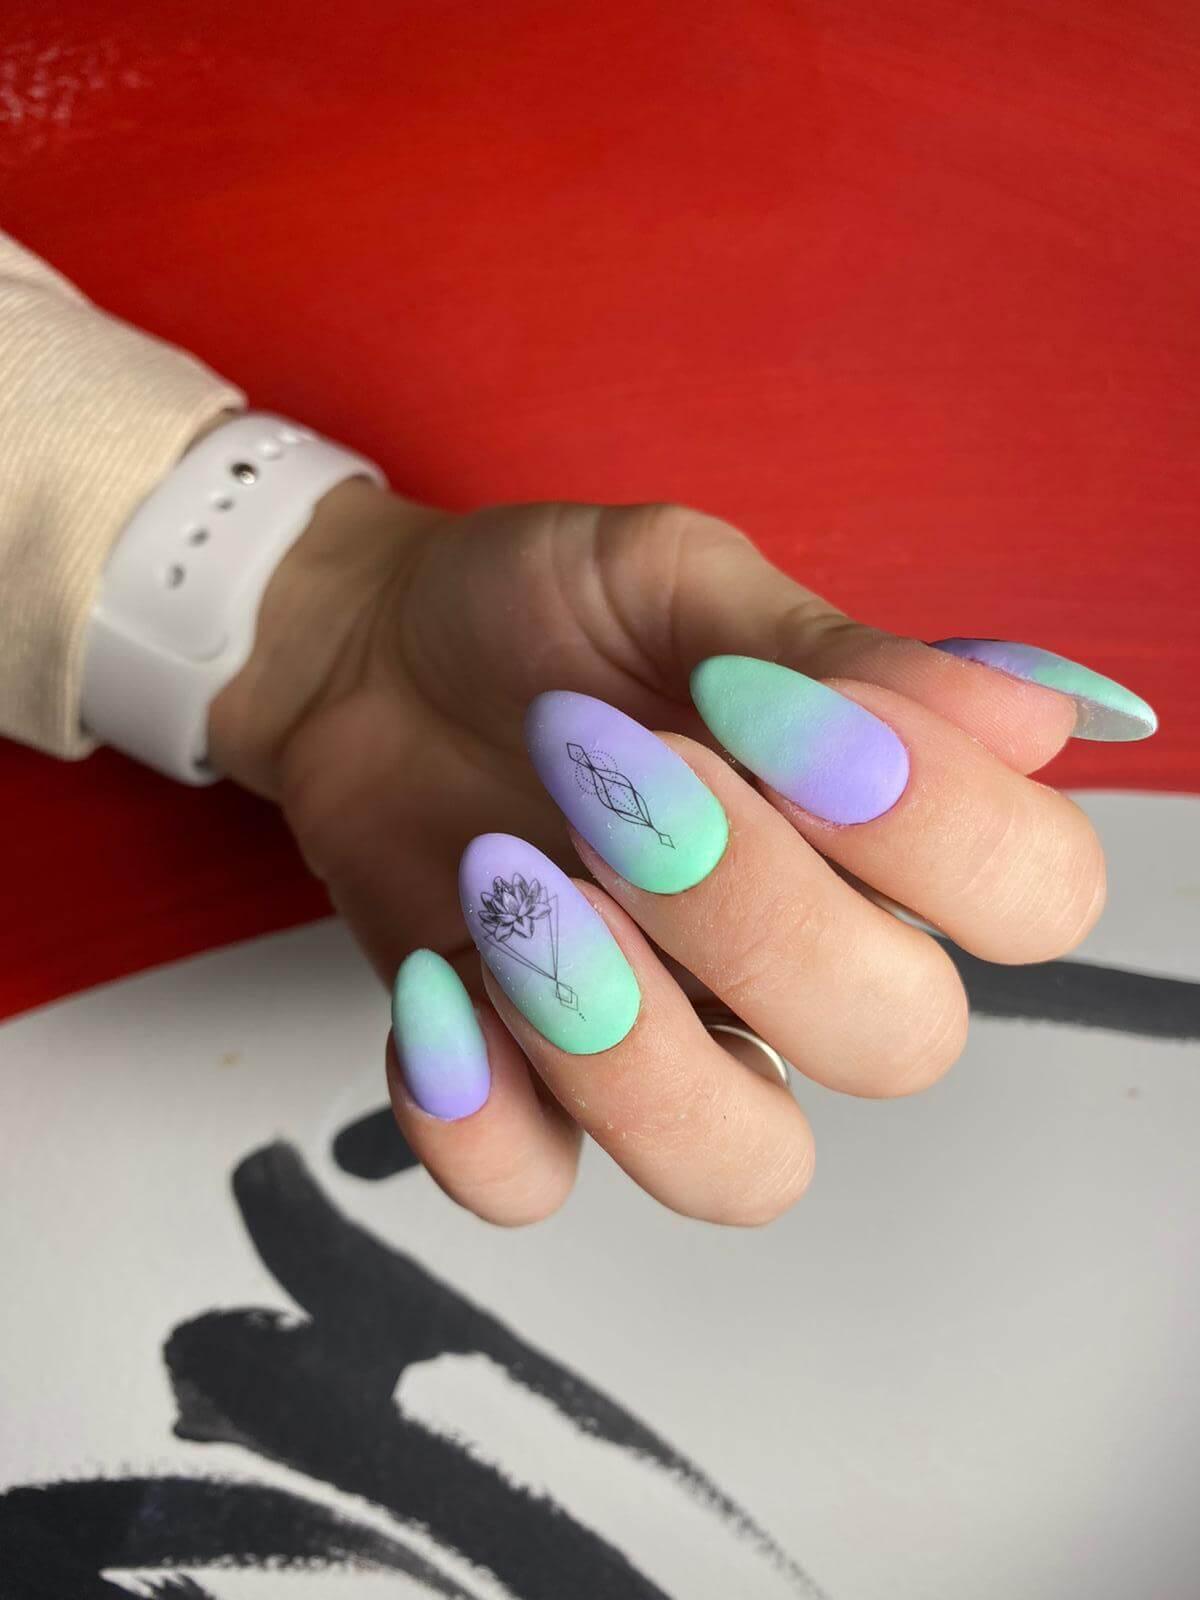 Ombre gel manicure